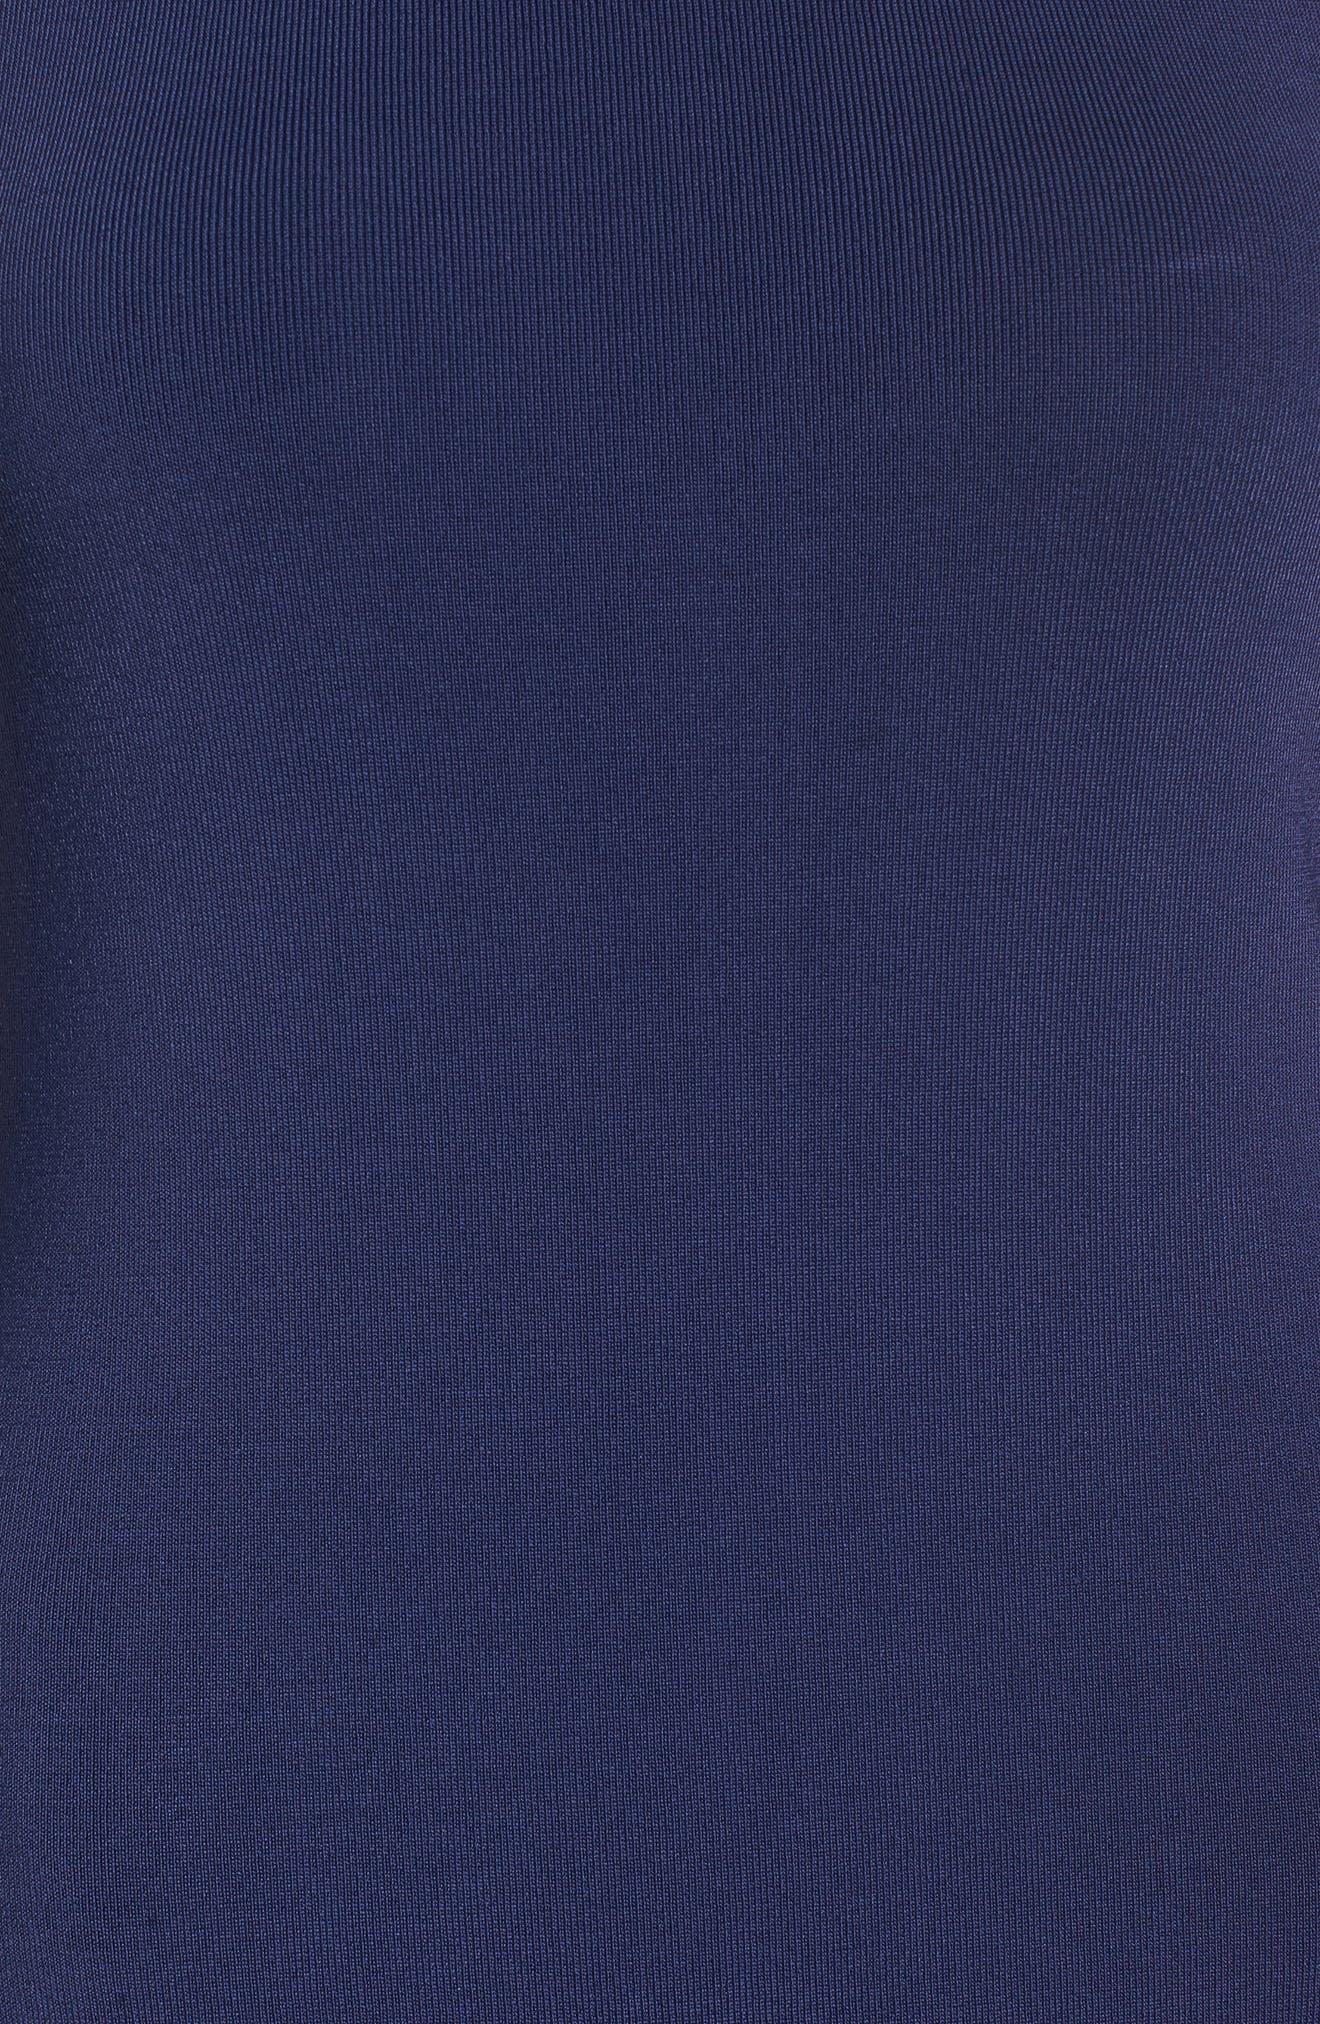 Sleeveless Mock Neck Knit Dress,                             Alternate thumbnail 33, color,